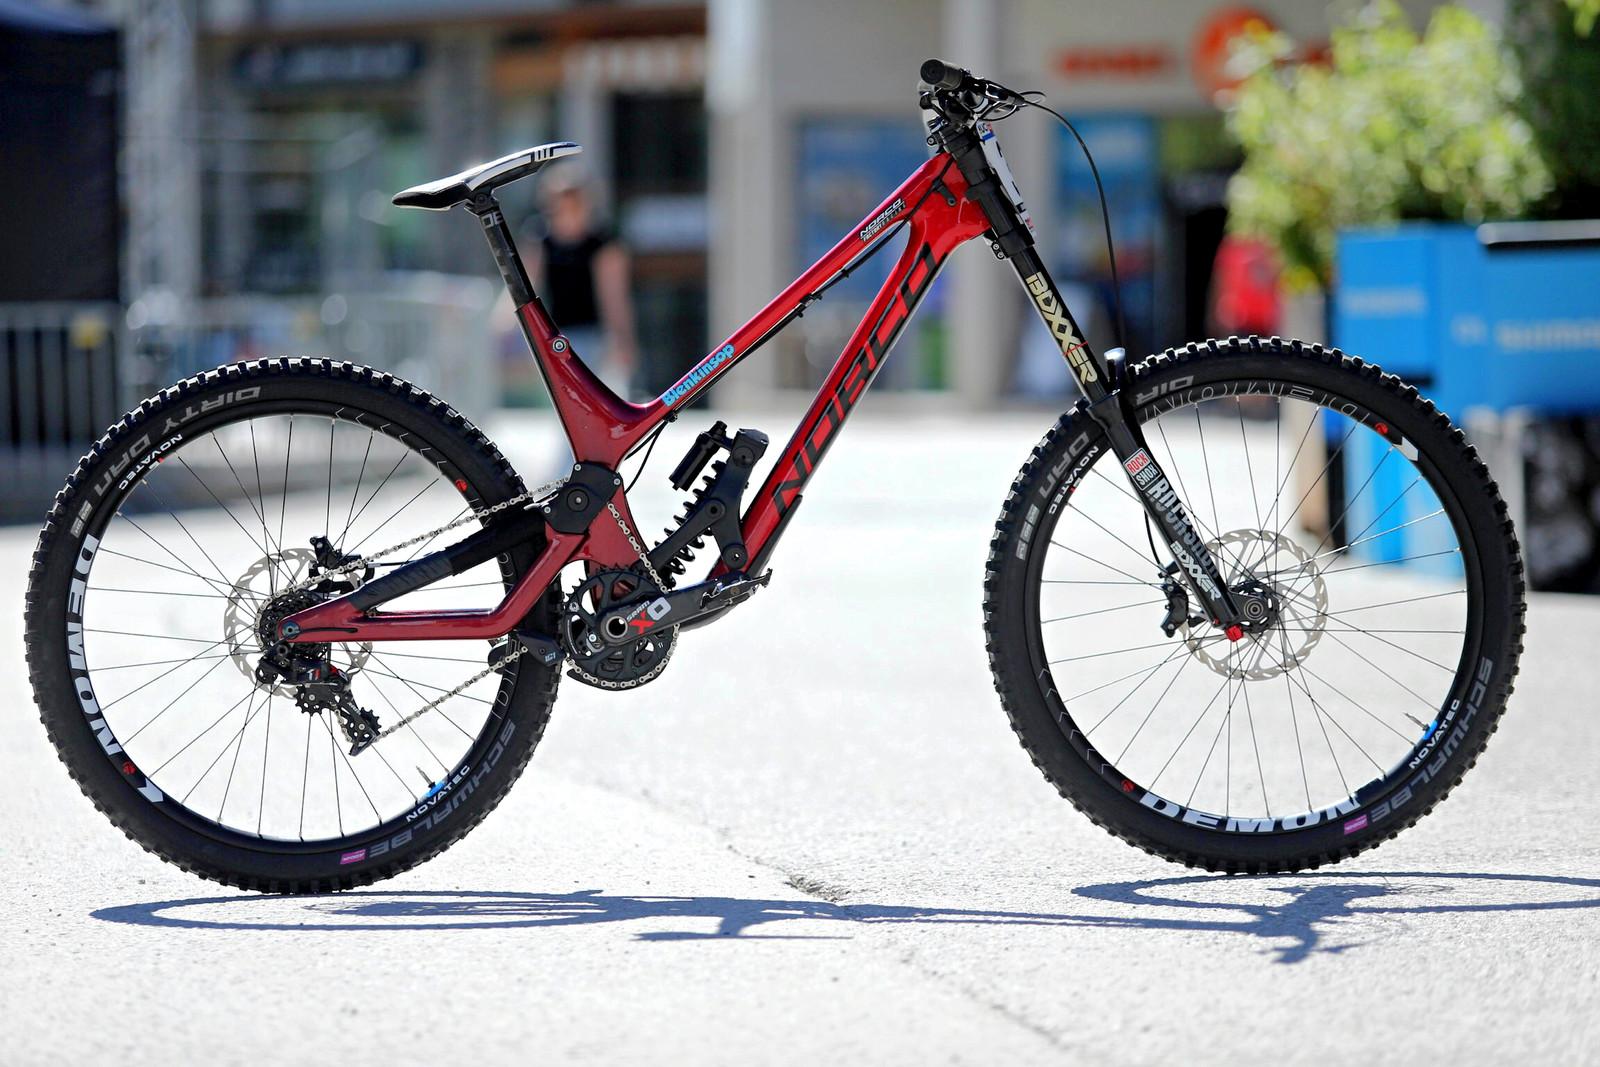 Sam Blenkinsop's Prototype Norco DH Bike - 2017 Leogang World Cup Pit Bits - Mountain Biking Pictures - Vital MTB